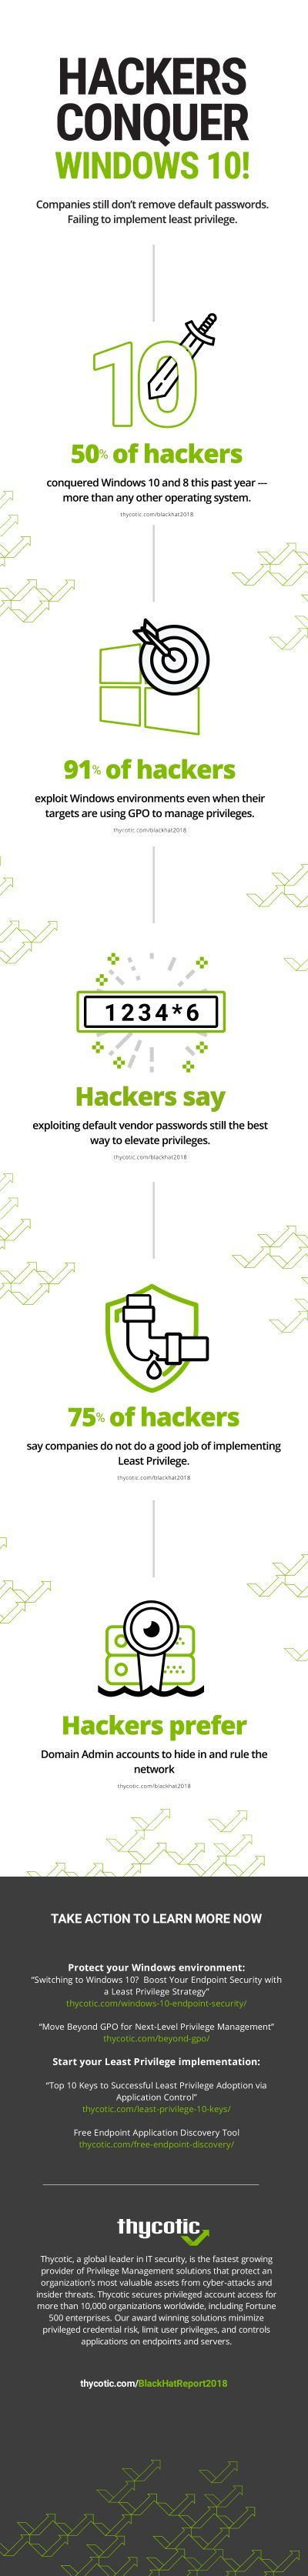 Thycotic-Black-Hat-Hacker-Report-2018